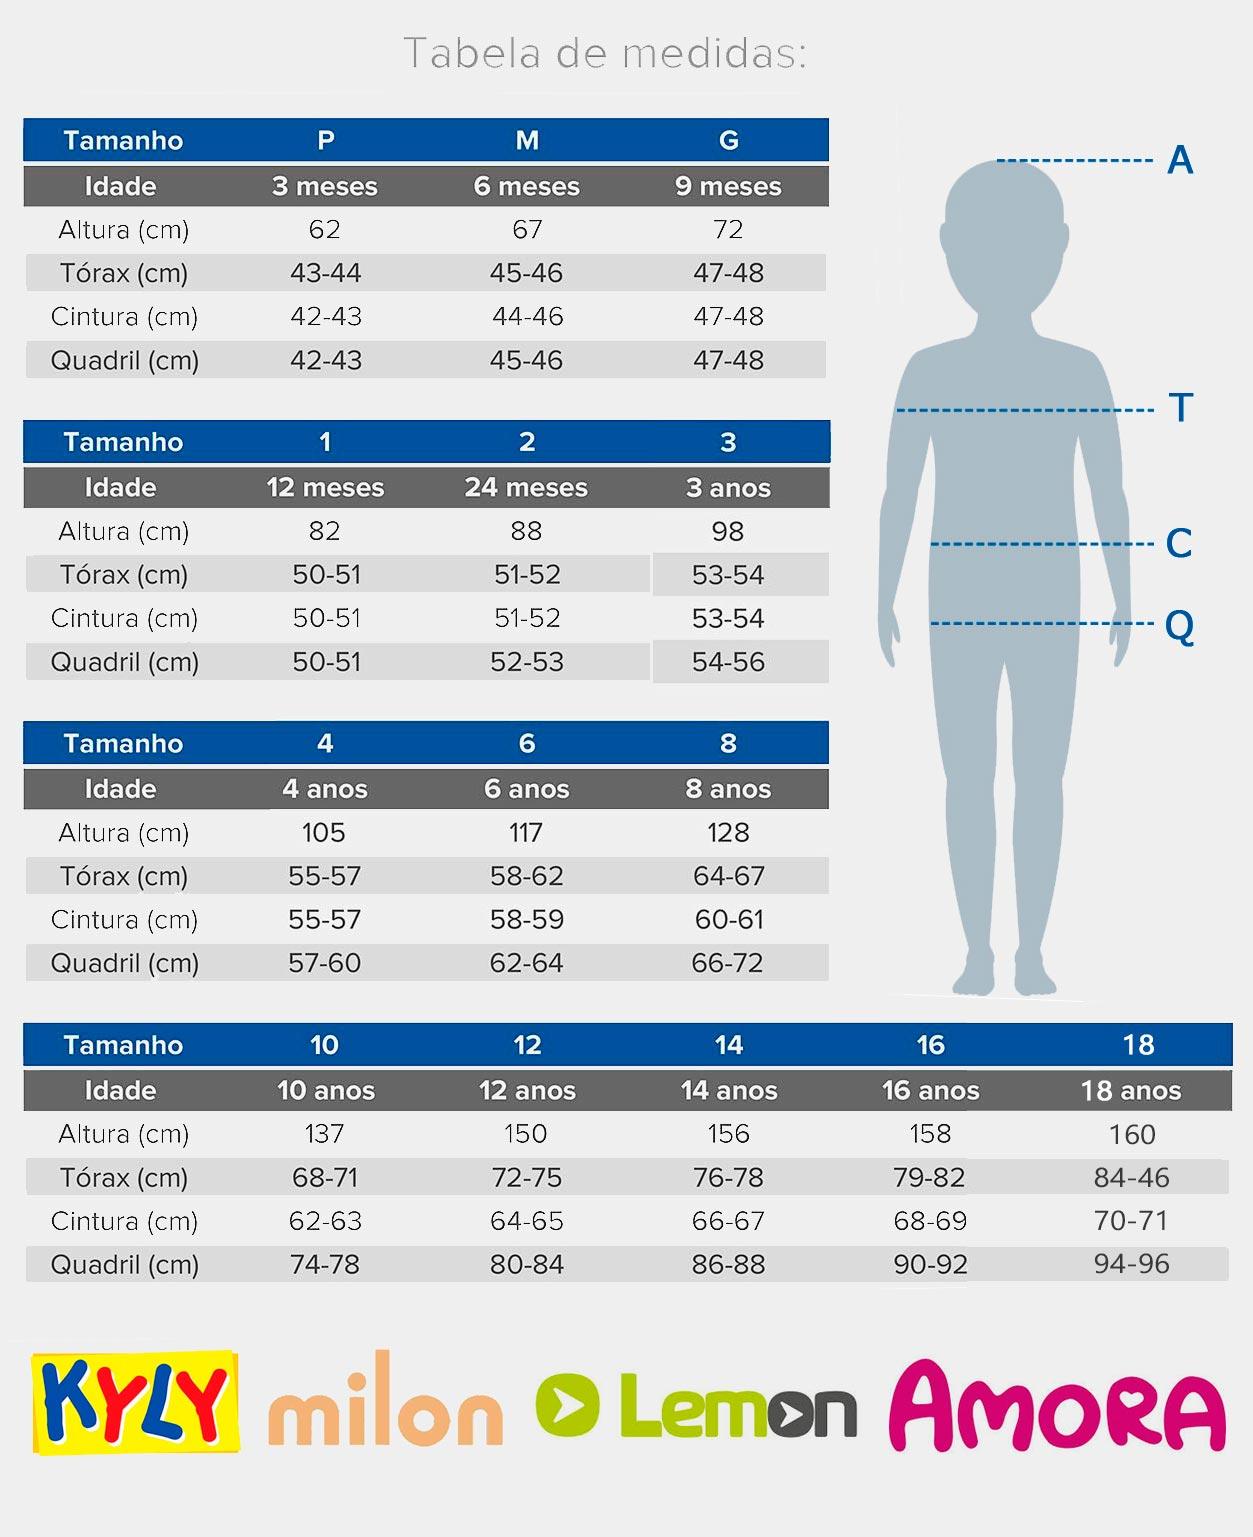 Vestido Infantil Curto Azul Melancias - Kyly: Tabela de medidas